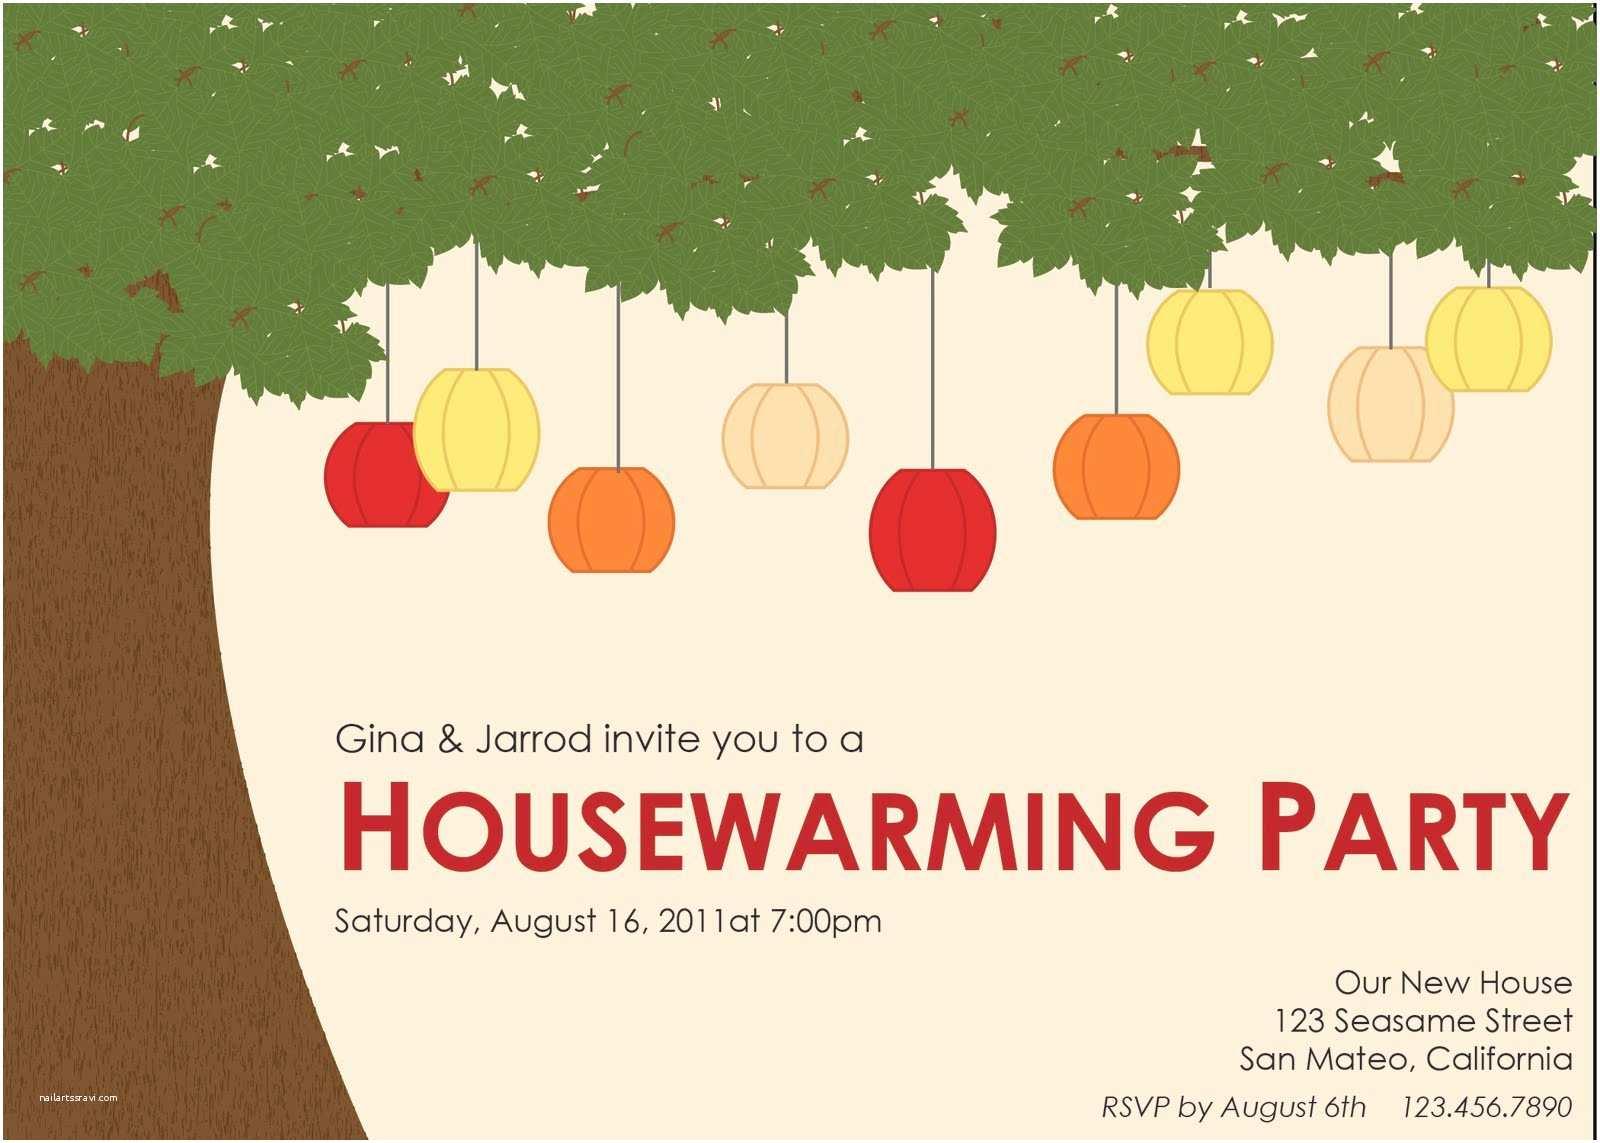 Housewarming Party Invitations Housewarming Invitation Templates Free Download